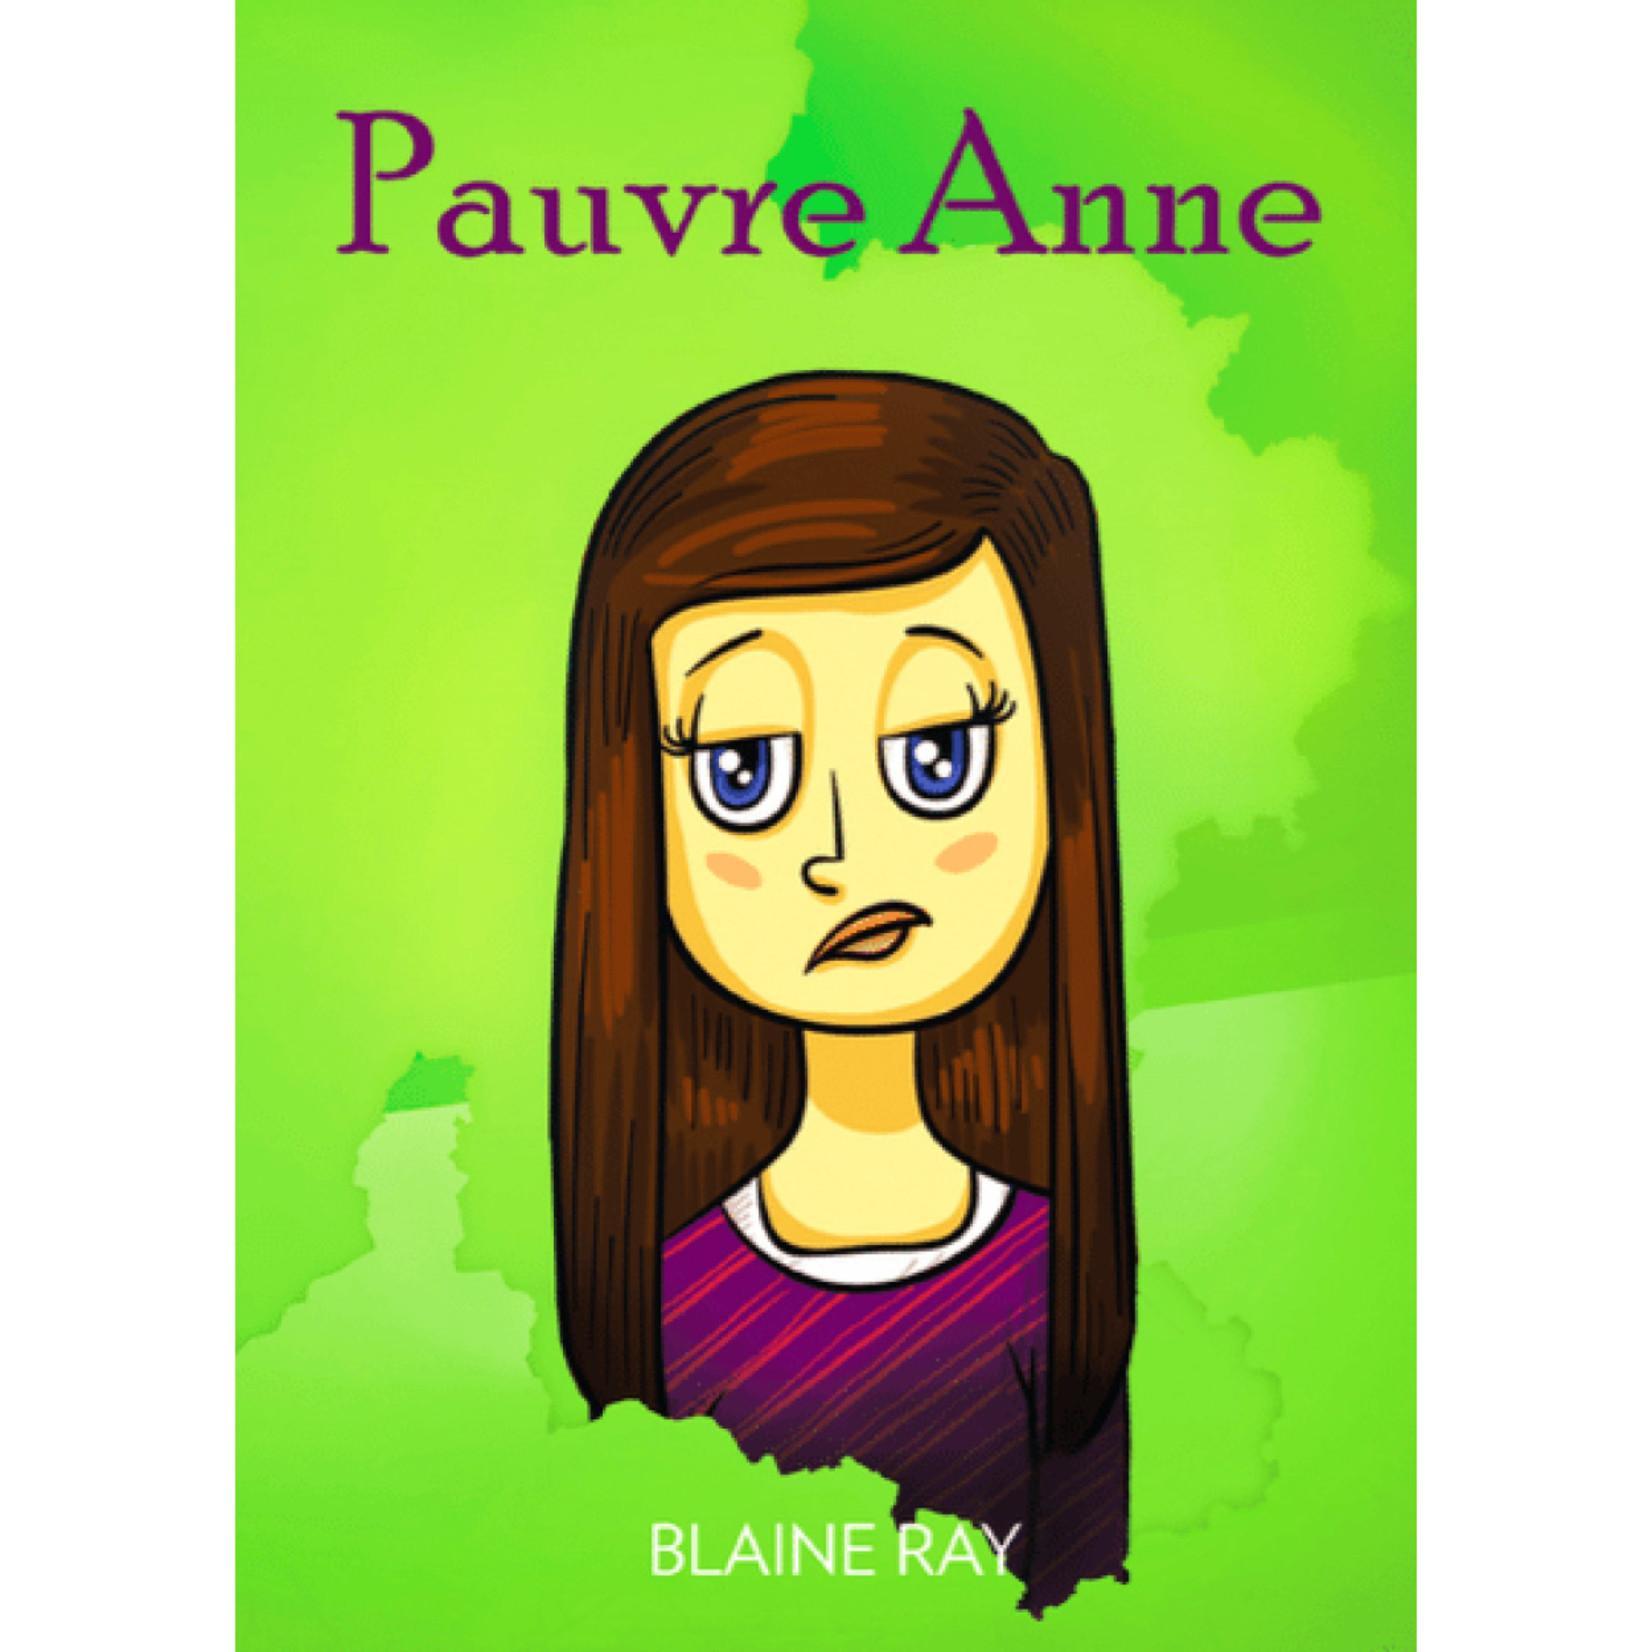 TPRS Books Pauvre Anne